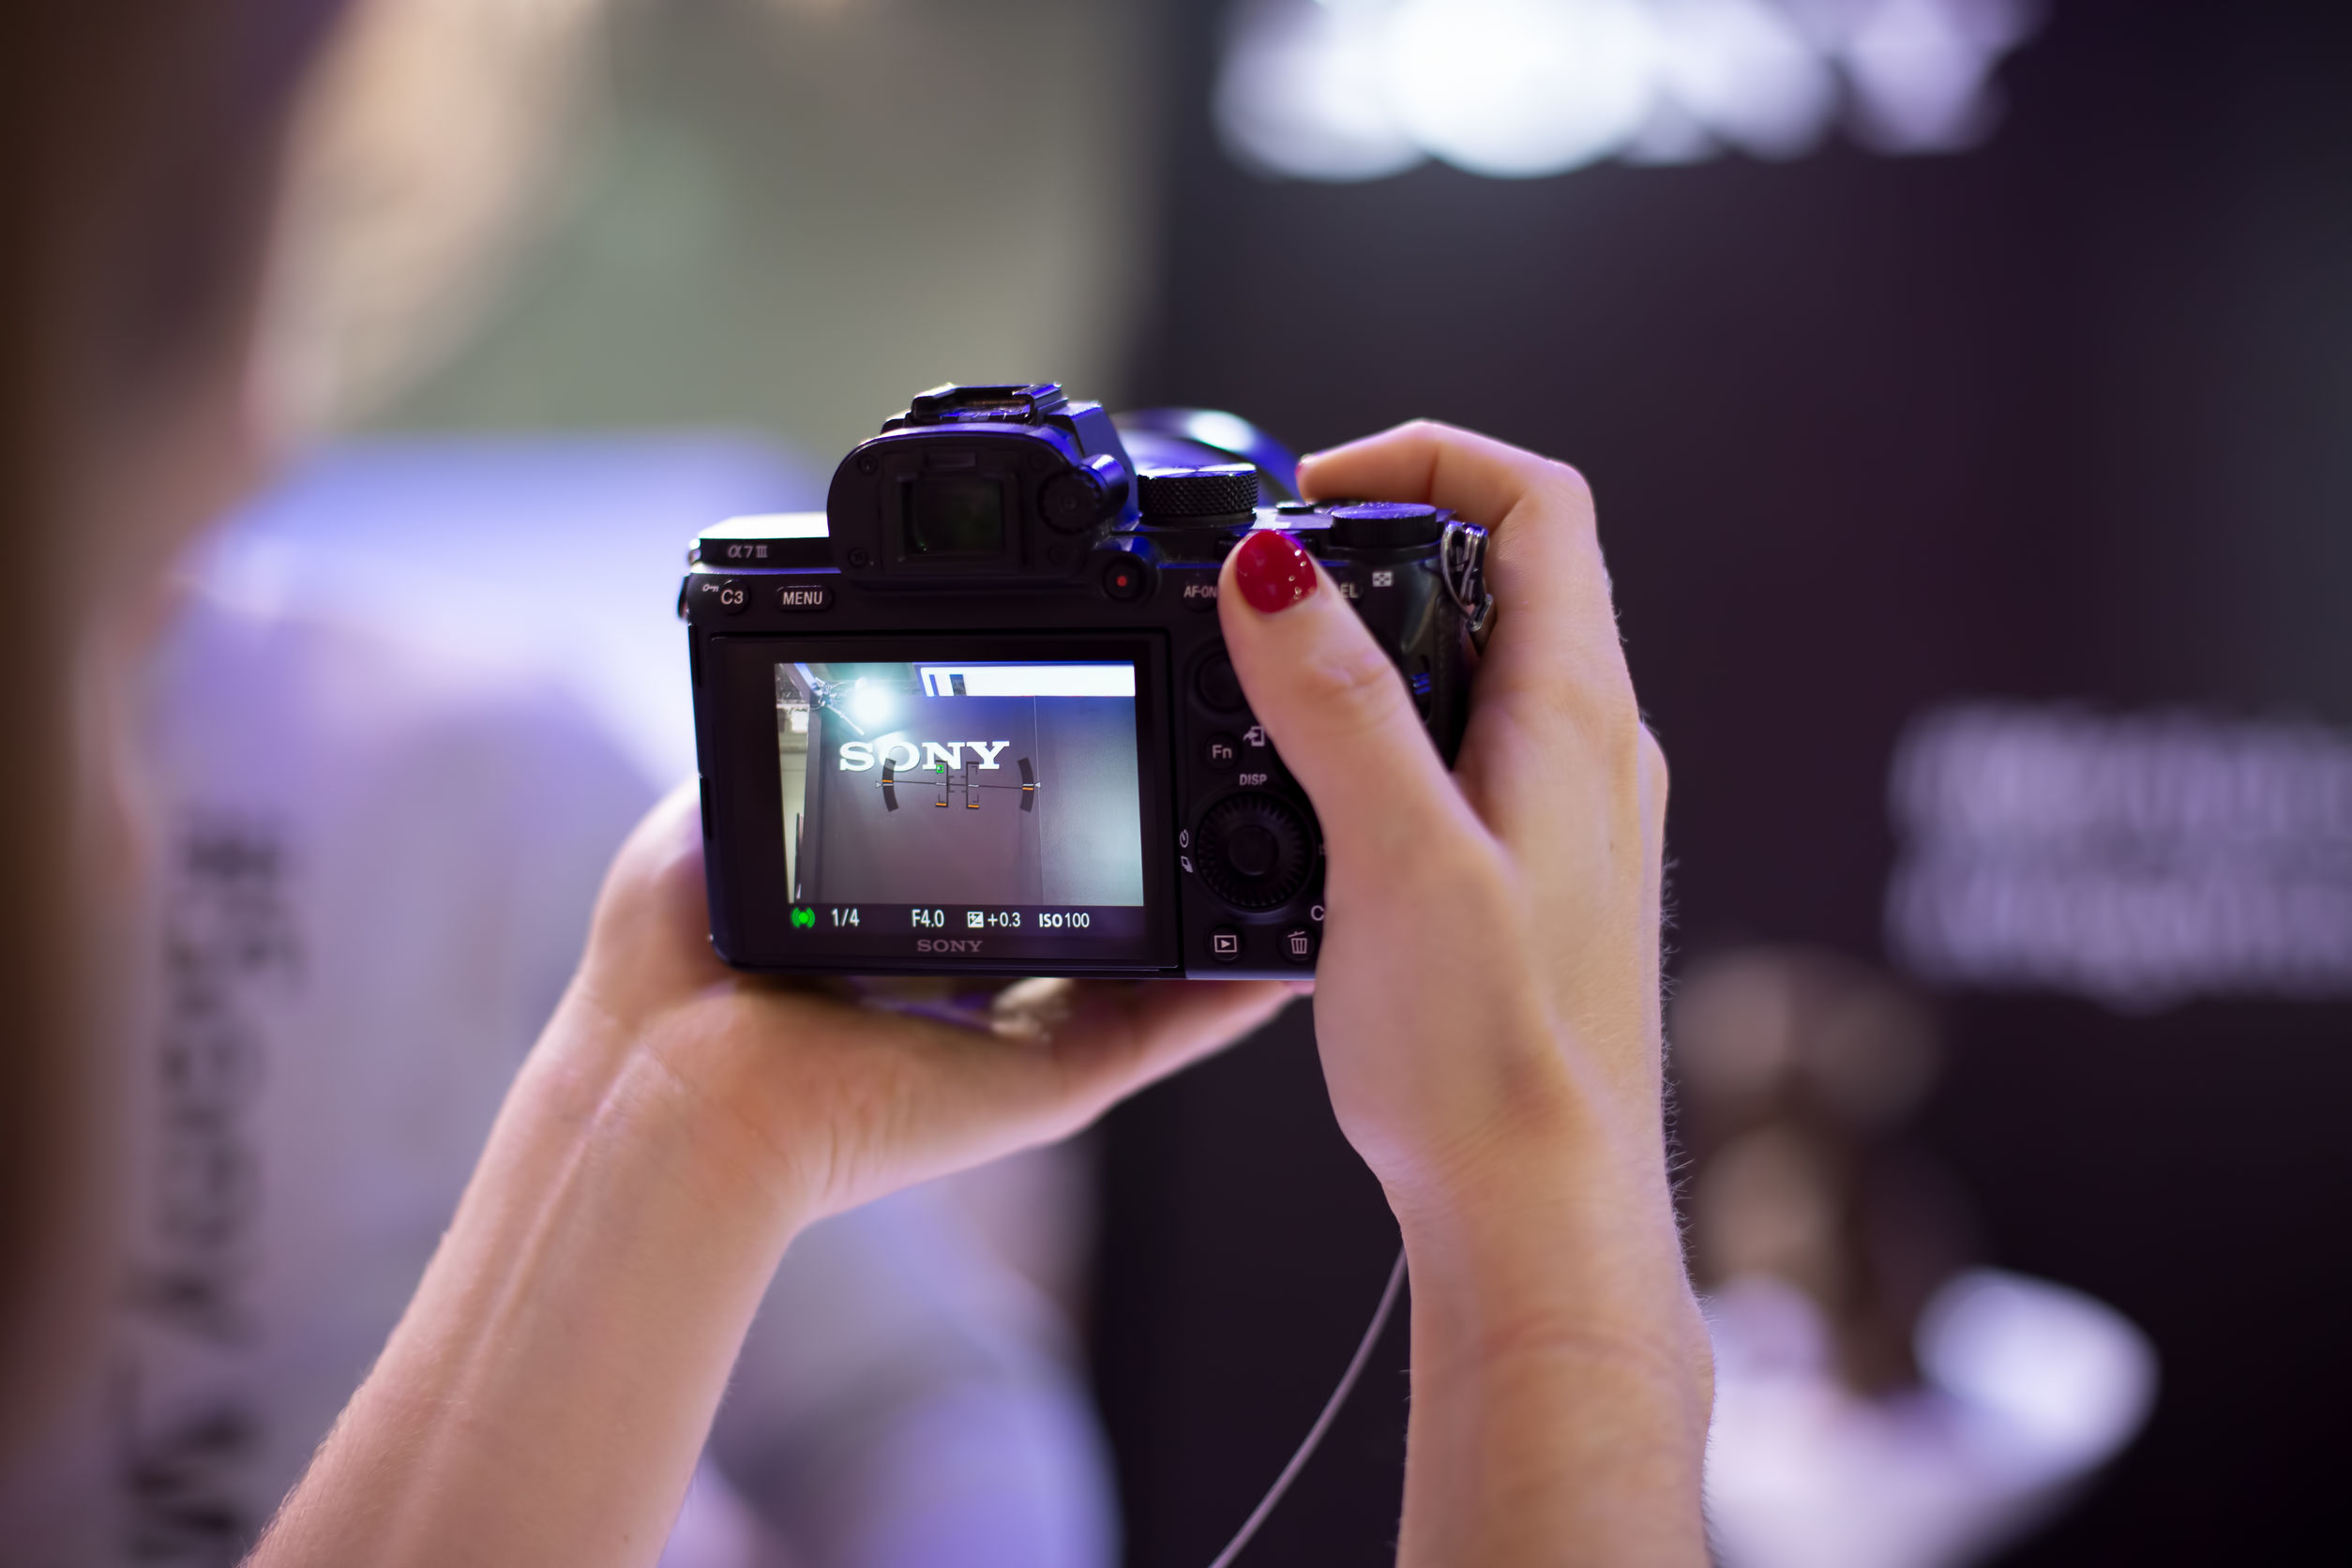 Sony Kompaktkamera: Test & Empfehlungen (03/21)